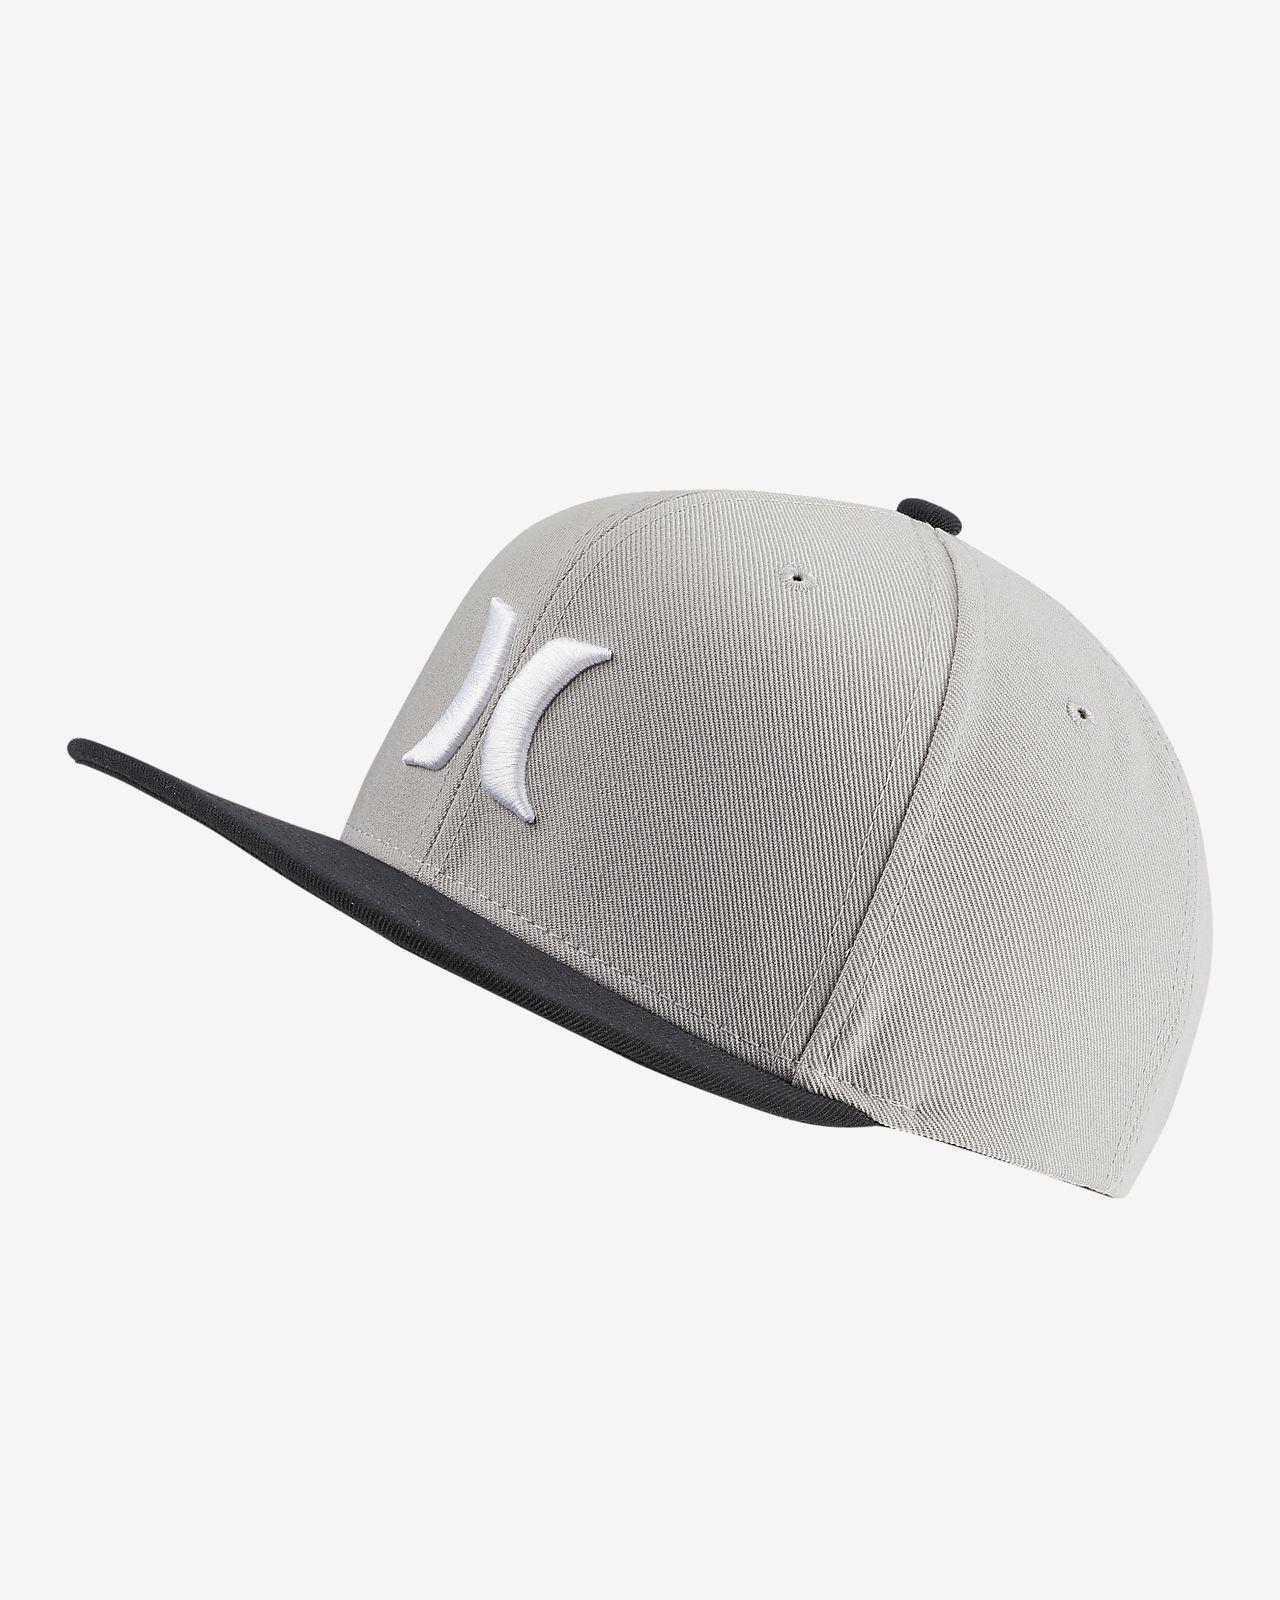 307b50ef8 Hurley Dri-FIT Icon Men's Hat